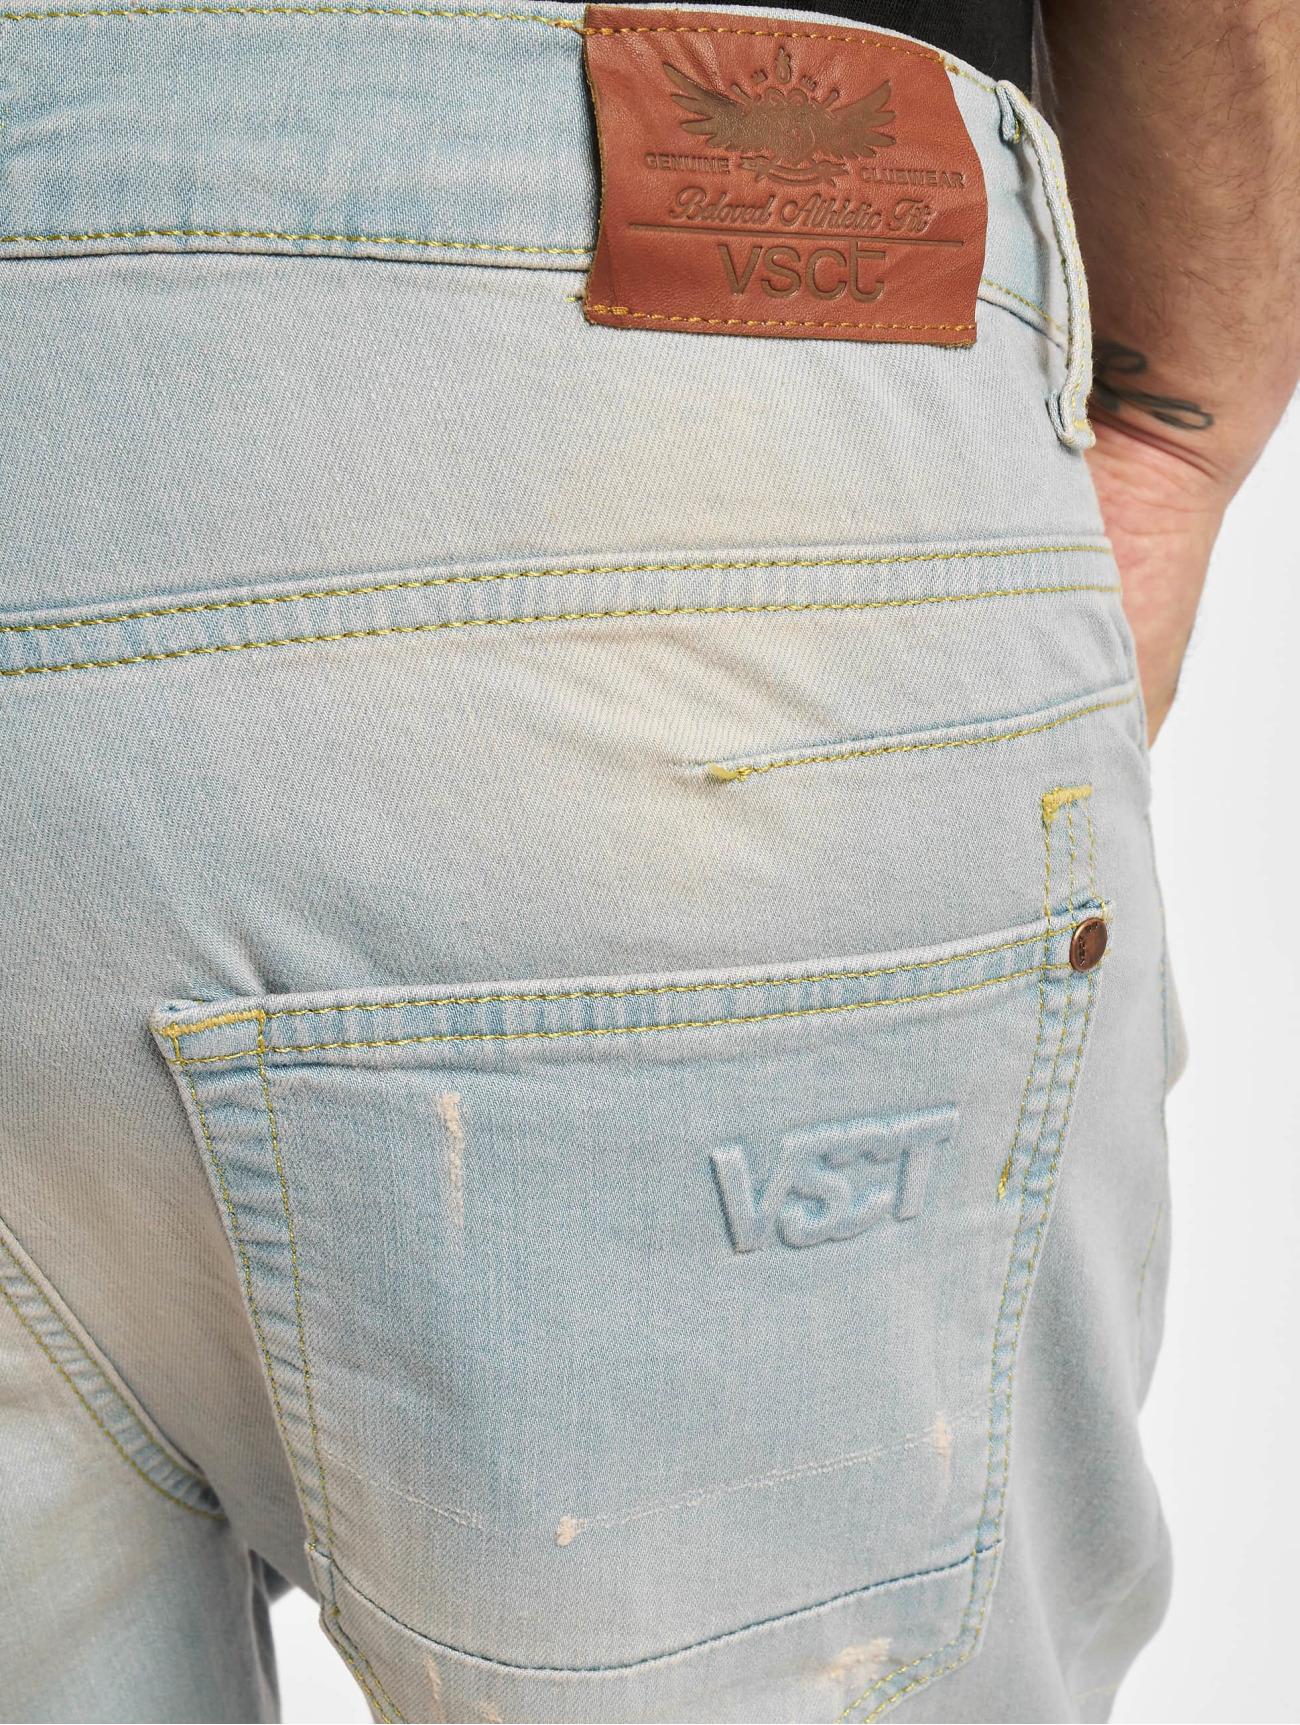 VSCT Clubwear  Noah Cuffed  bleu Homme Jean coupe droite  765434 Homme Jeans